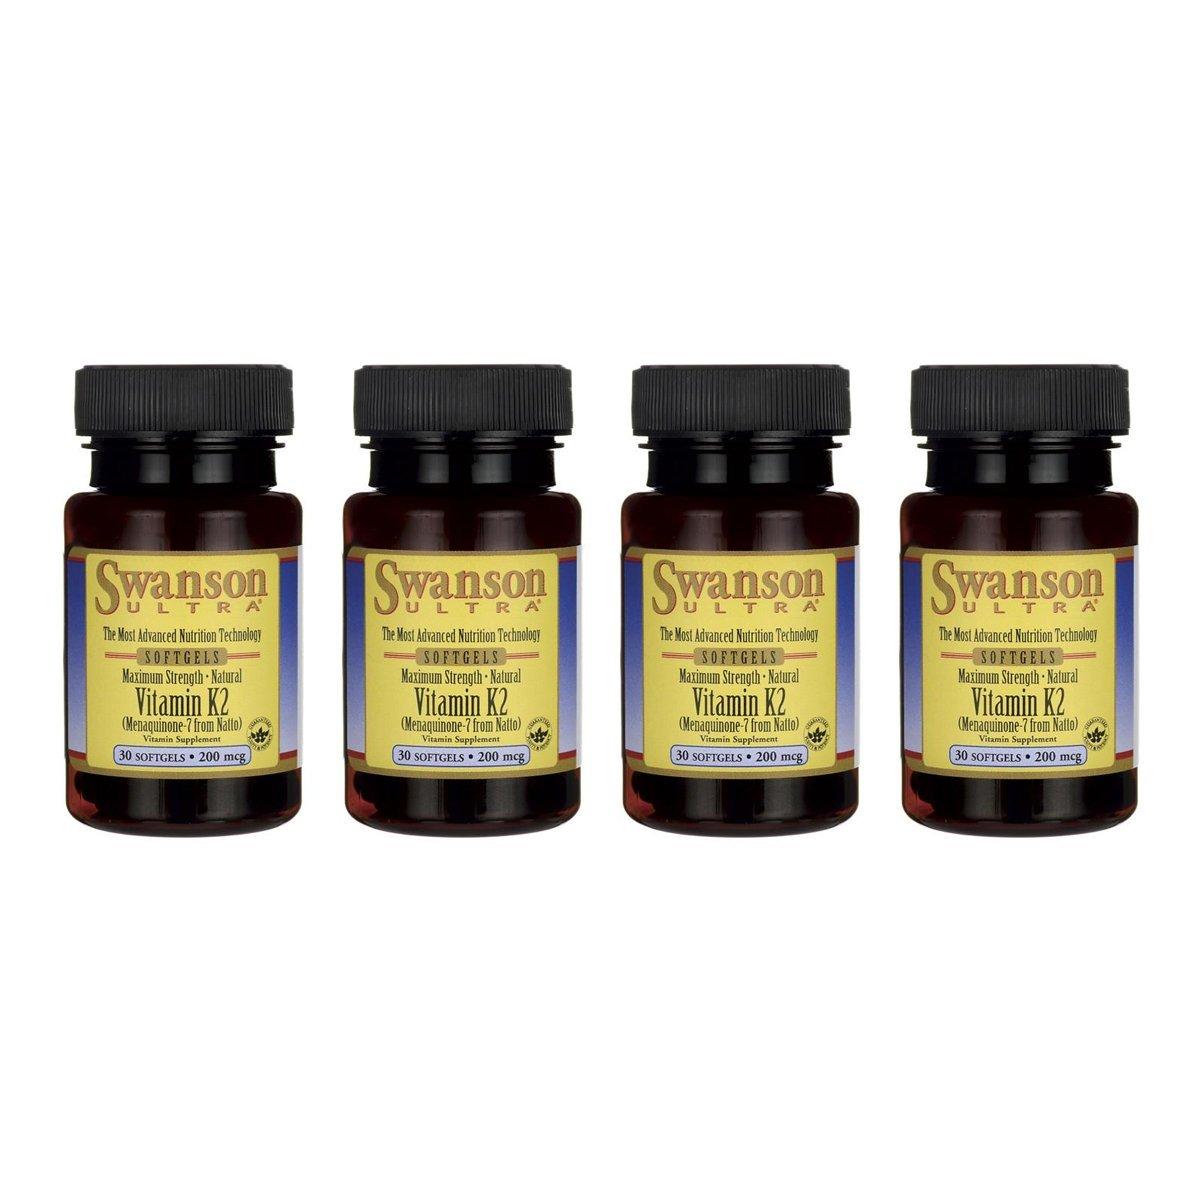 Swanson Real Food Vitamin K-2 - Maximum Strength 200 mcg 30 Sgels 4 Pack